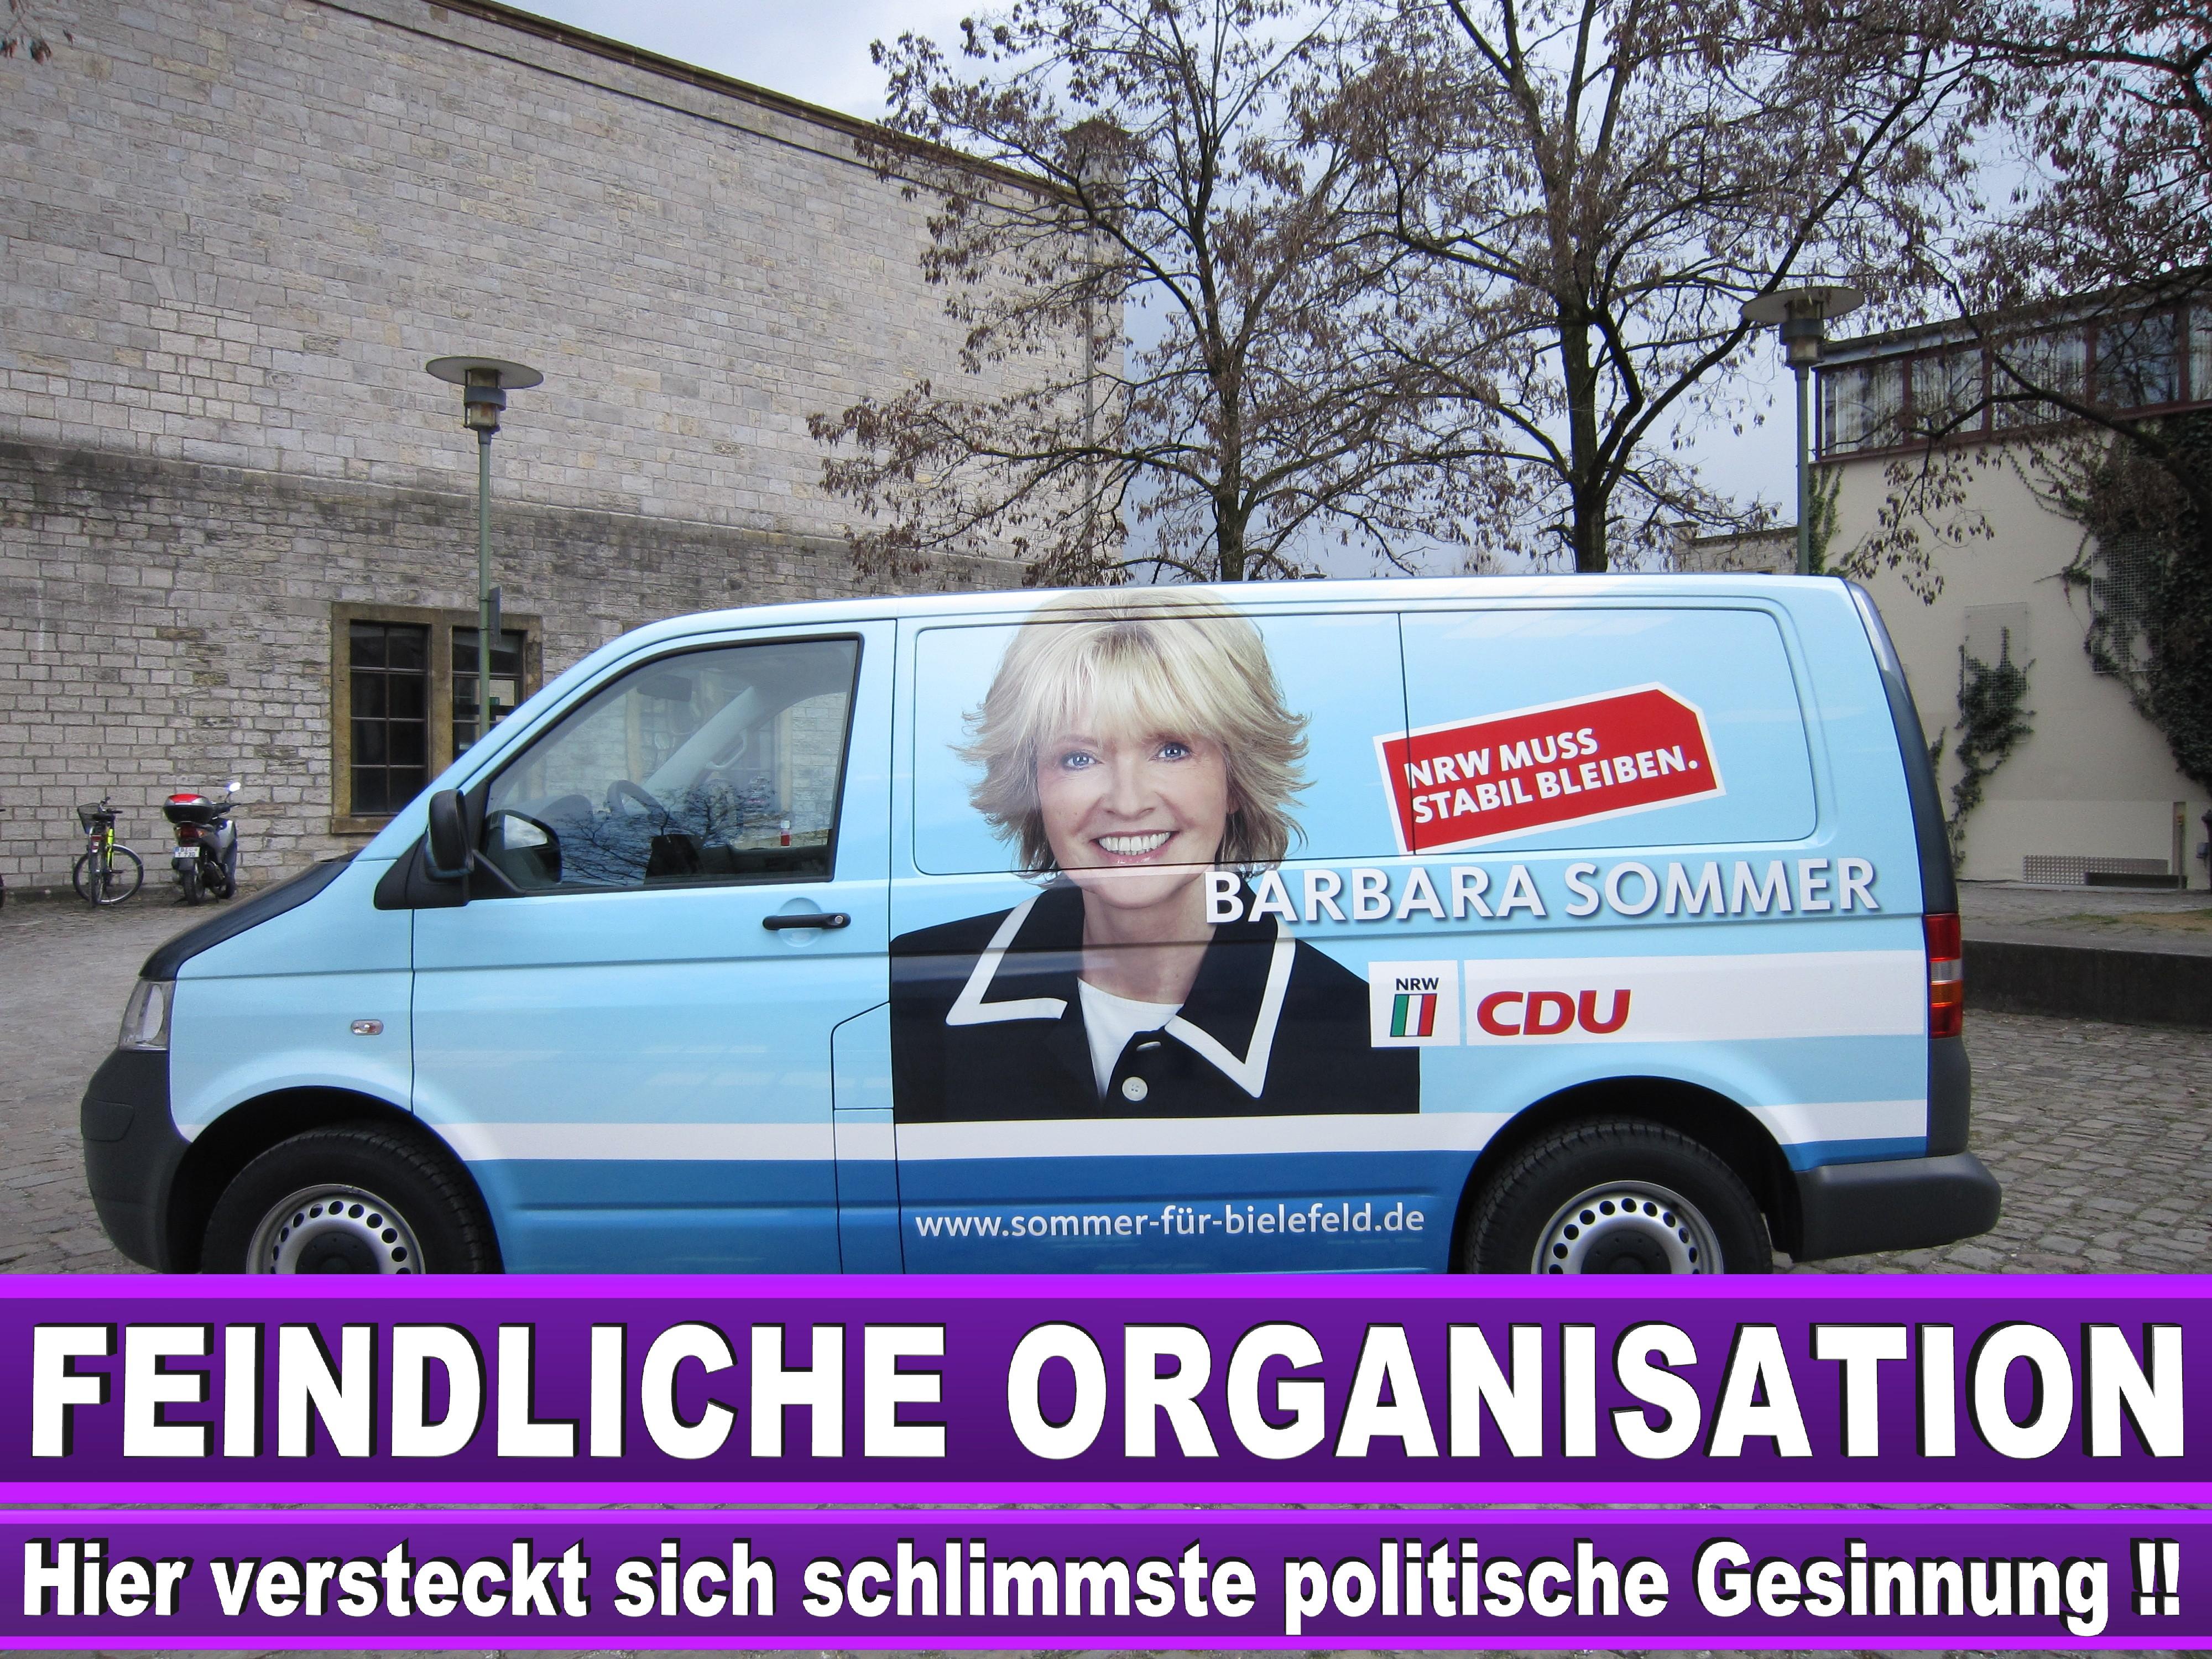 Europawahl Kandidaten Afd